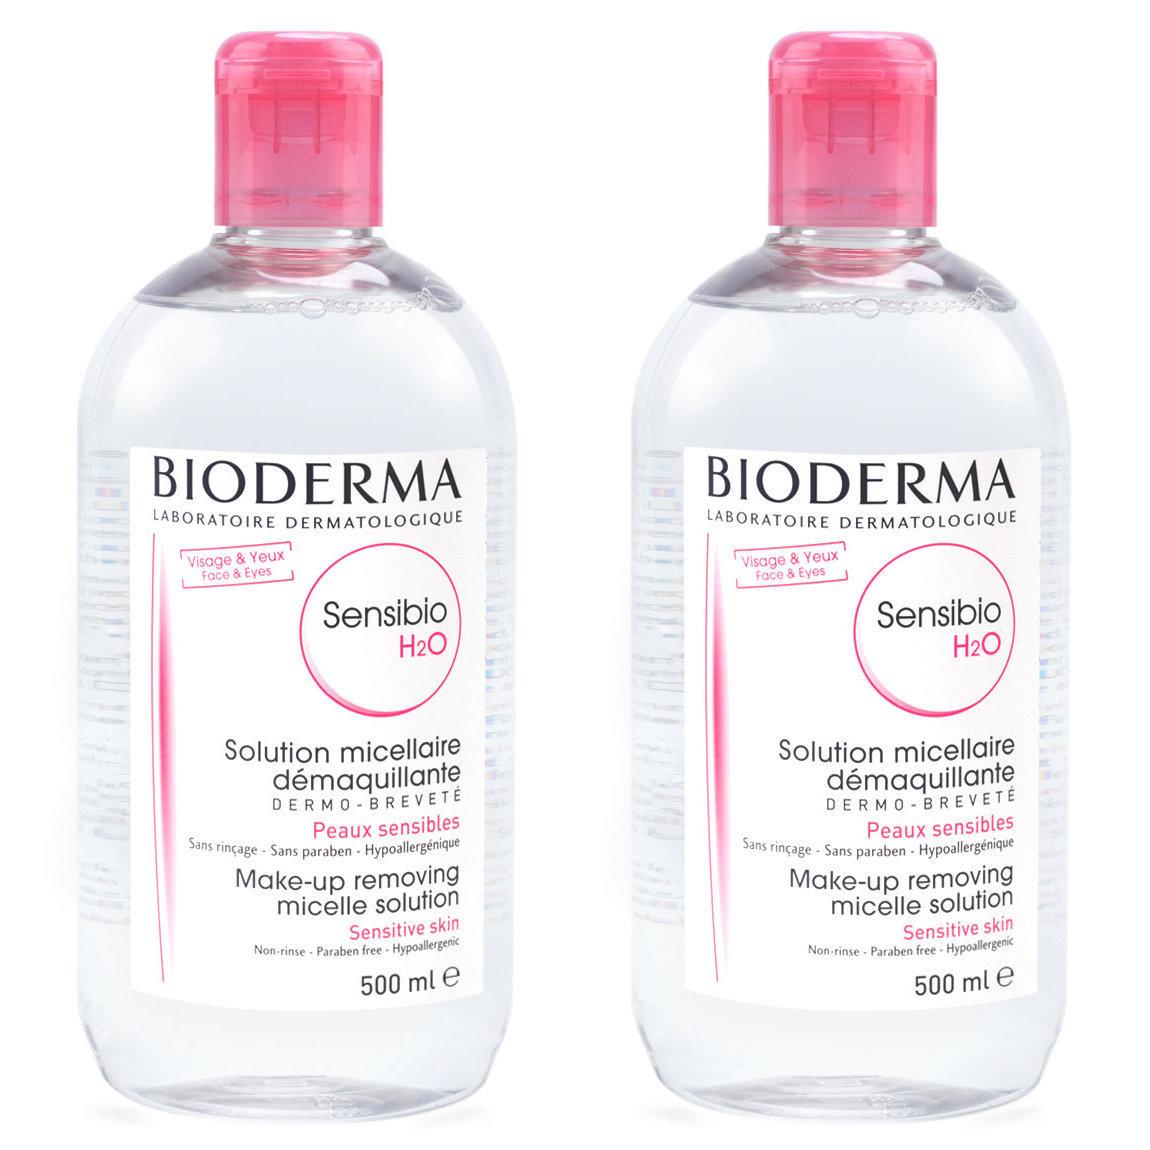 Bioderma Sensibio H2O 500 ml Duo product swatch.